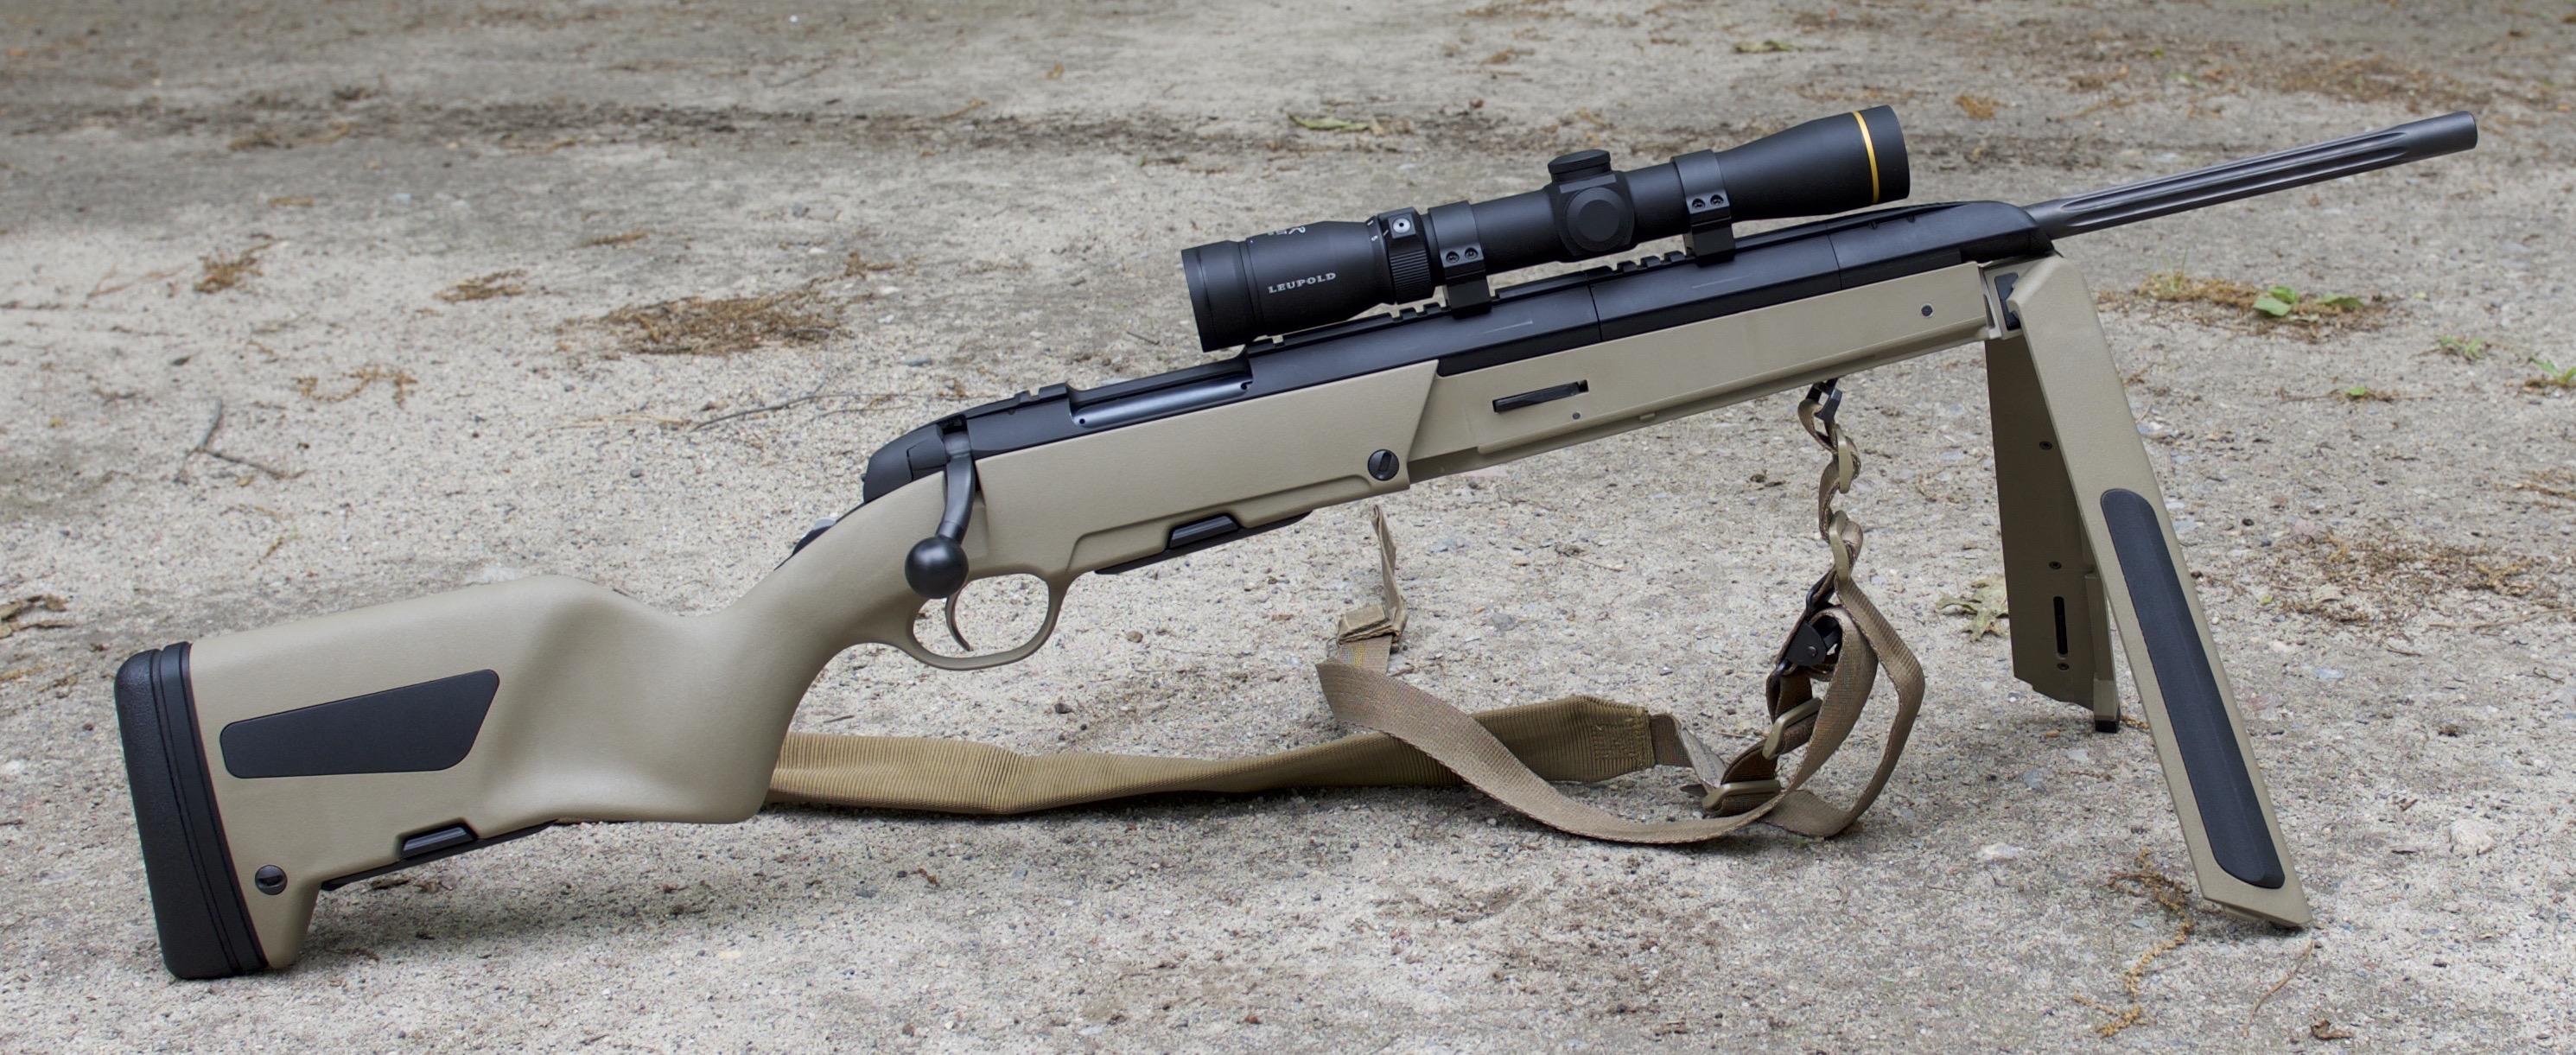 the scout rifle  a one gun solution   u2013 rifleshooter com